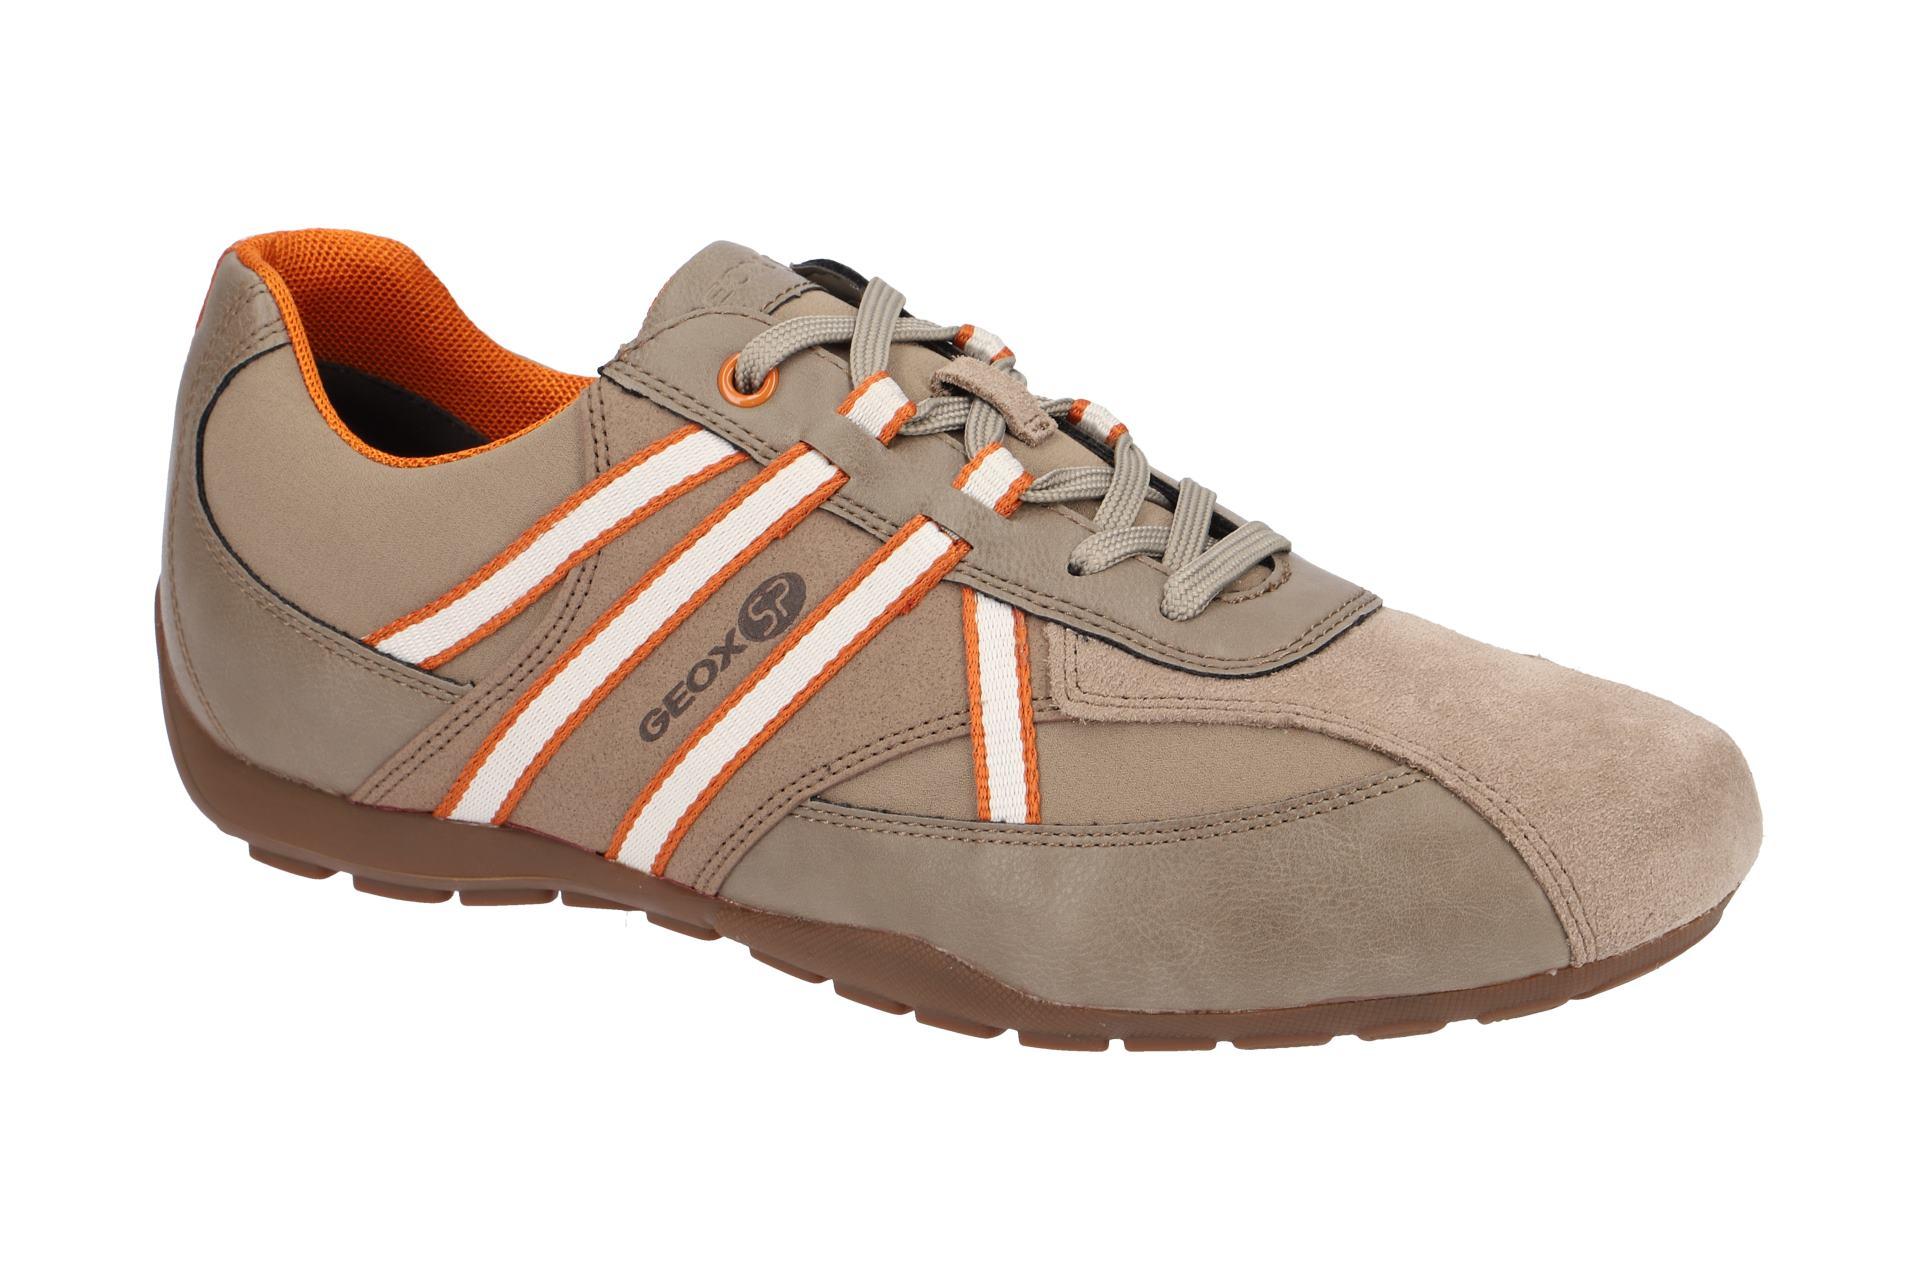 Geox Sneaker Schuhe RaveX beige orange